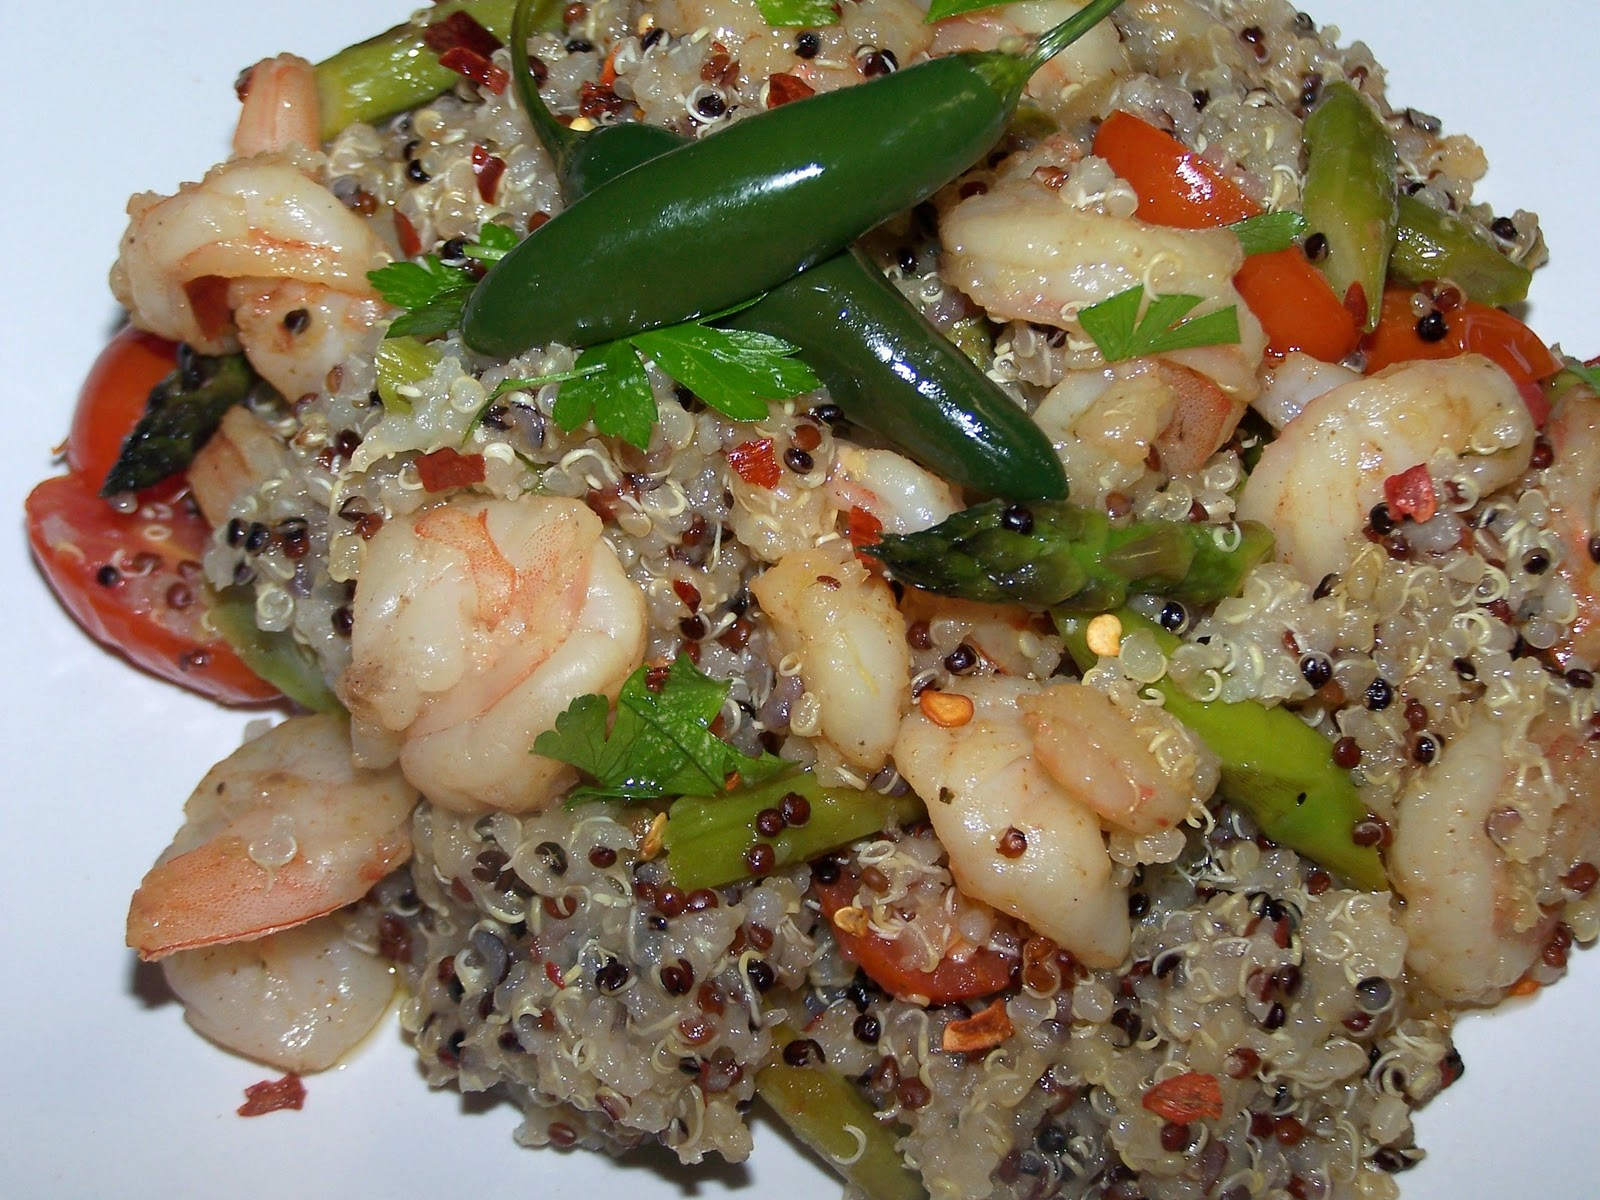 EZ Gluten Free: Quinoa with Shrimp and Asparagus